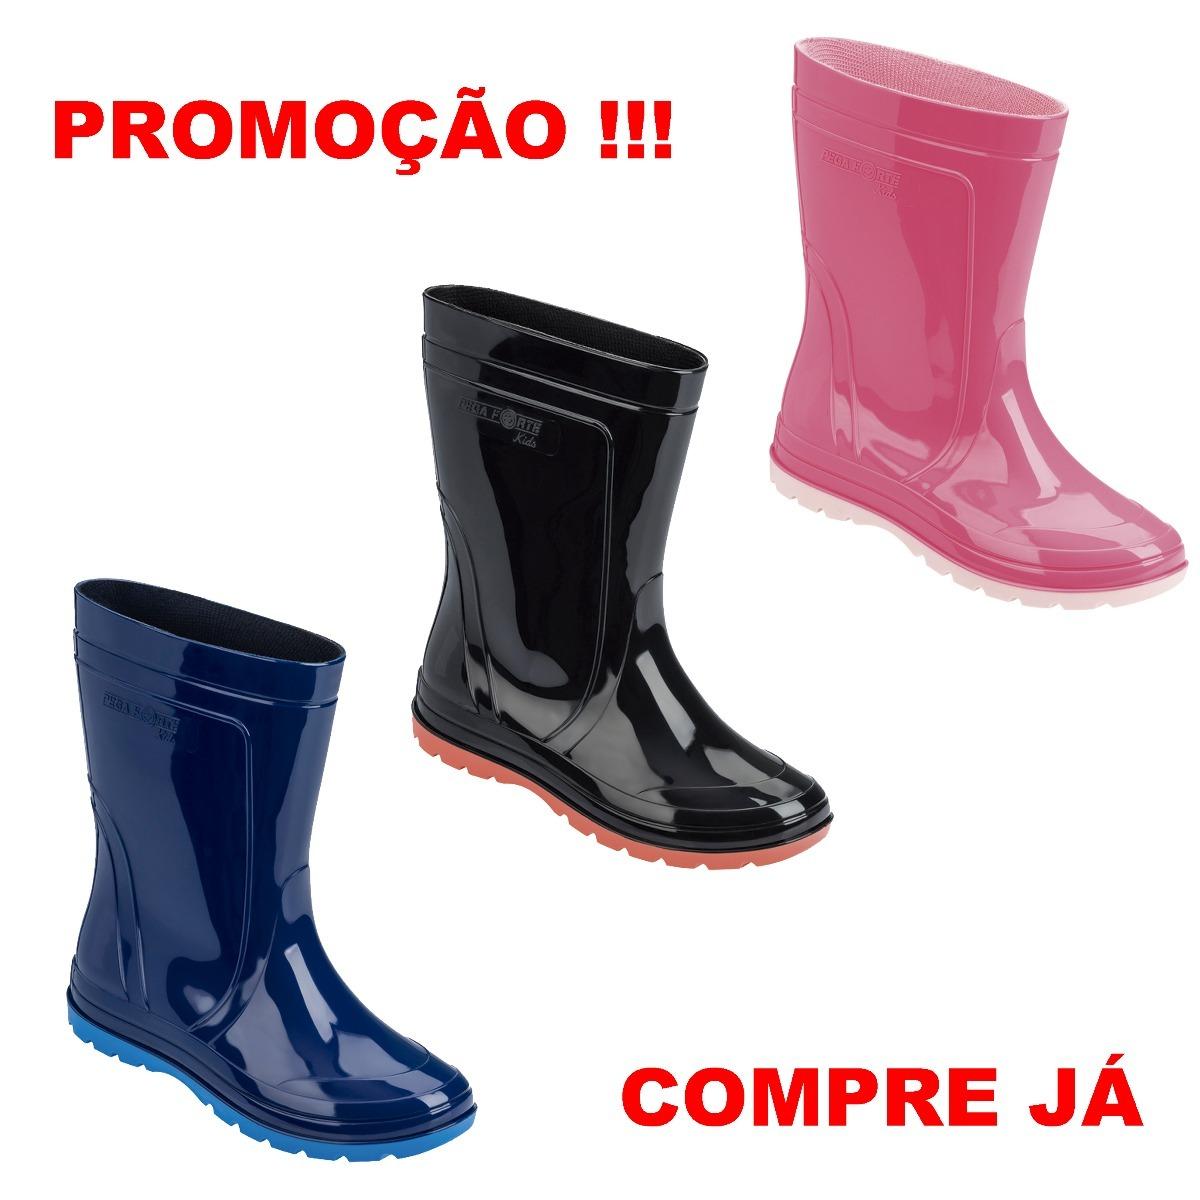 4995f19d0c4 Bota Galocha Infantil Azul rosa preta Kit C 3pares Borracha - R  126 ...